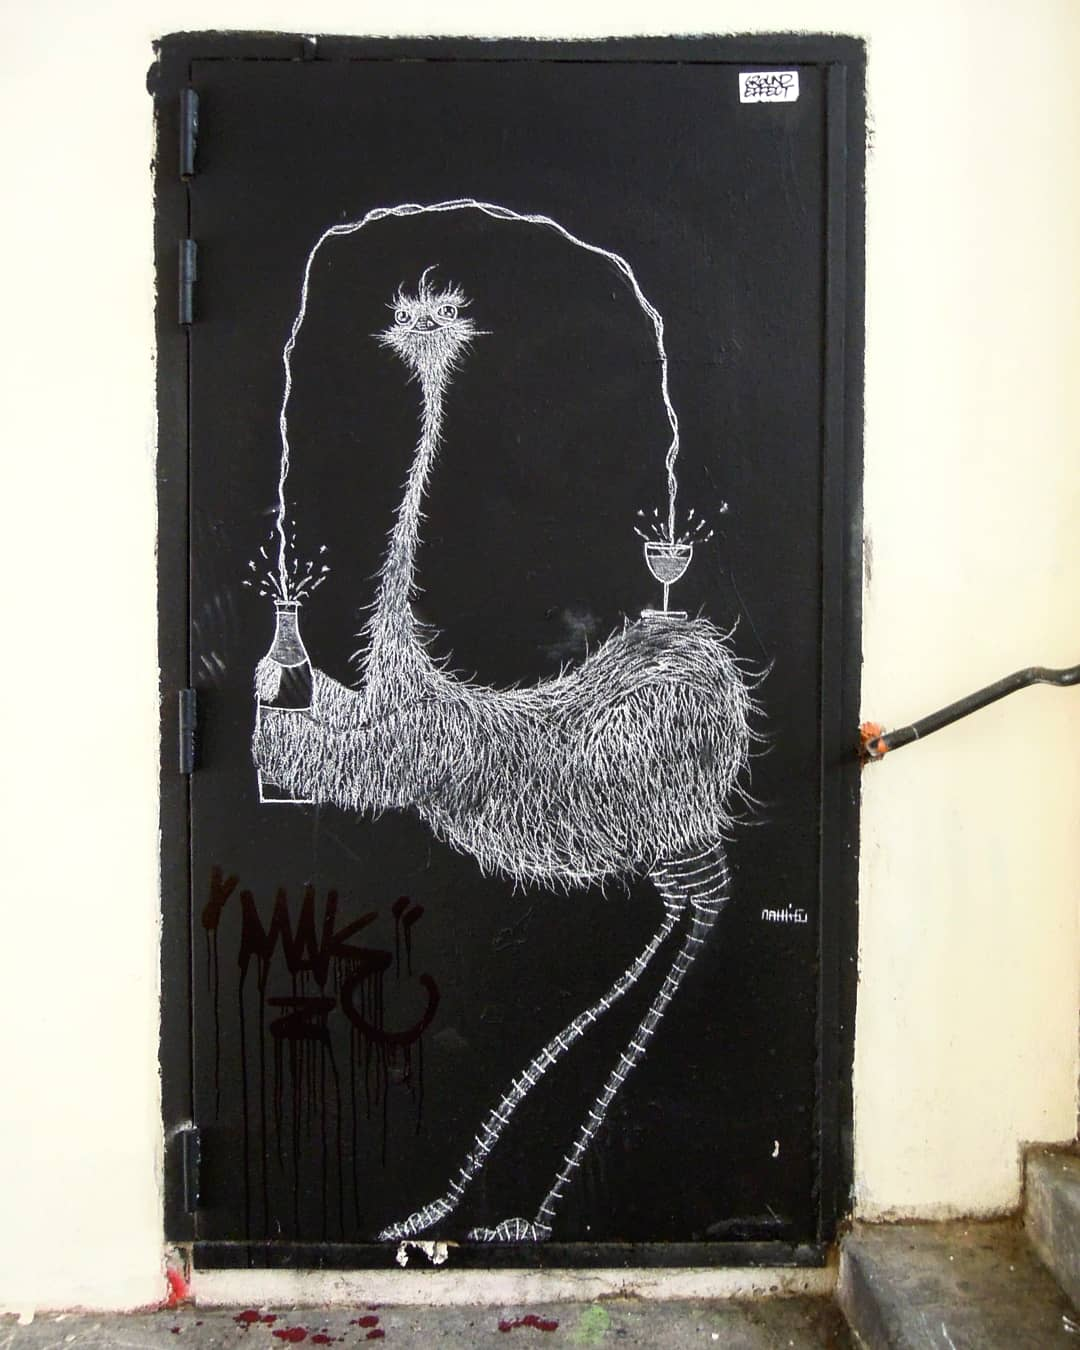 Portrait d'artiste street art